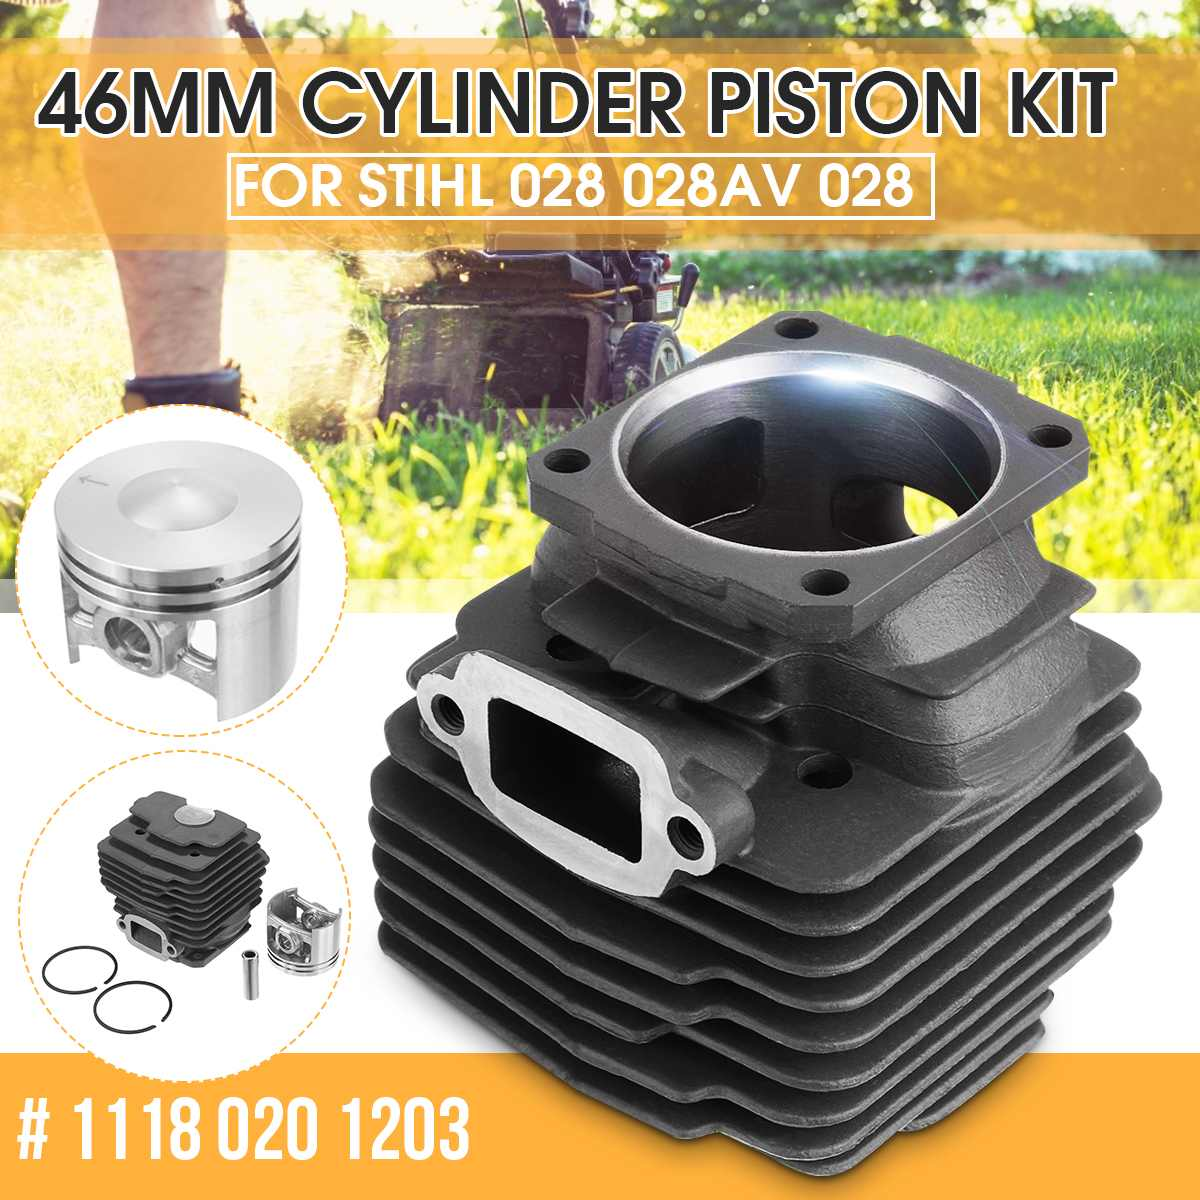 46mm Cylinder Piston Kit For STIHL 028 028AV 028 SUPER Q W WB Chainsaw Engine Motor Parts OEM#11180201203